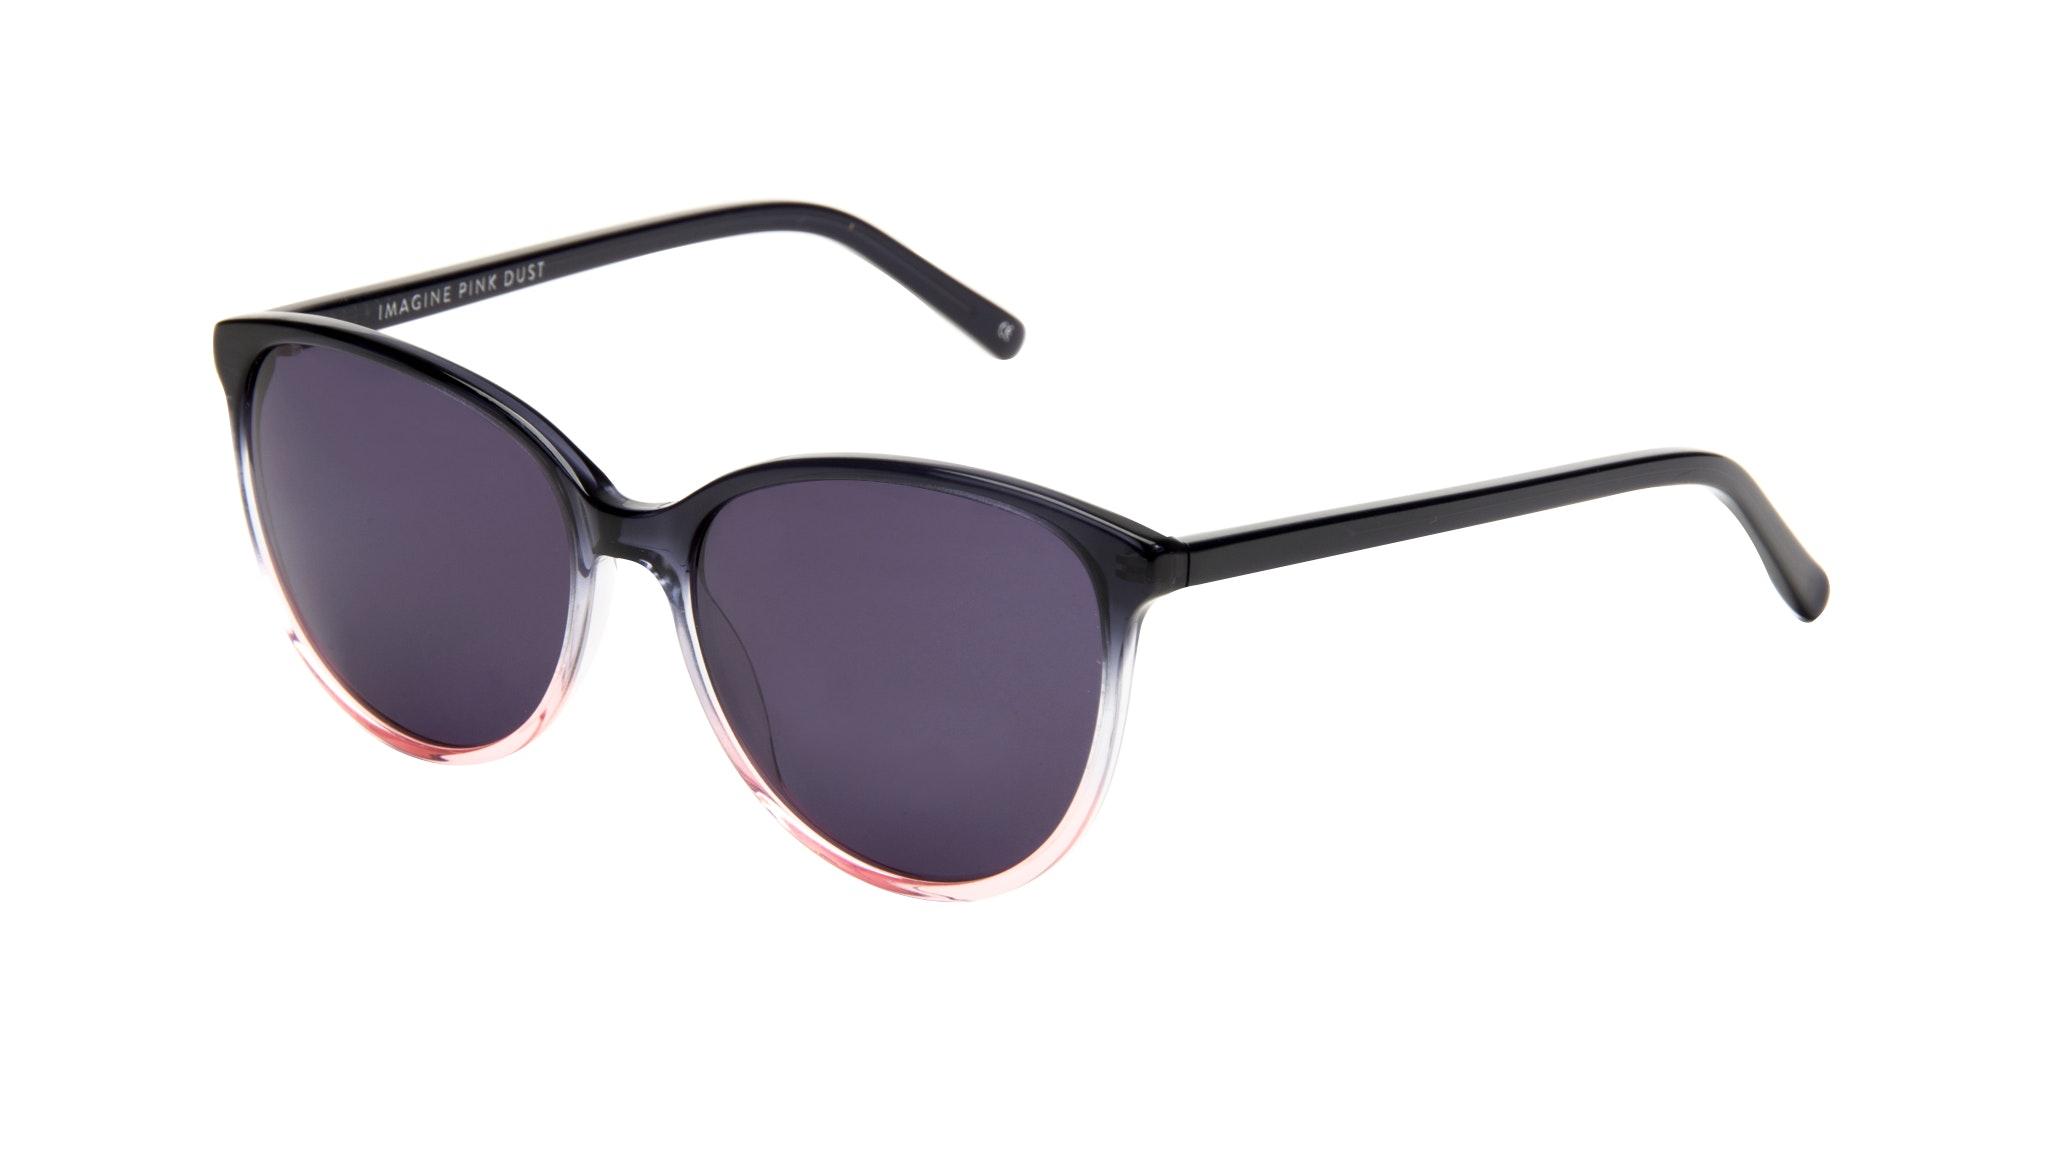 Affordable Fashion Glasses Round Sunglasses Women Imagine Pink Dust Tilt